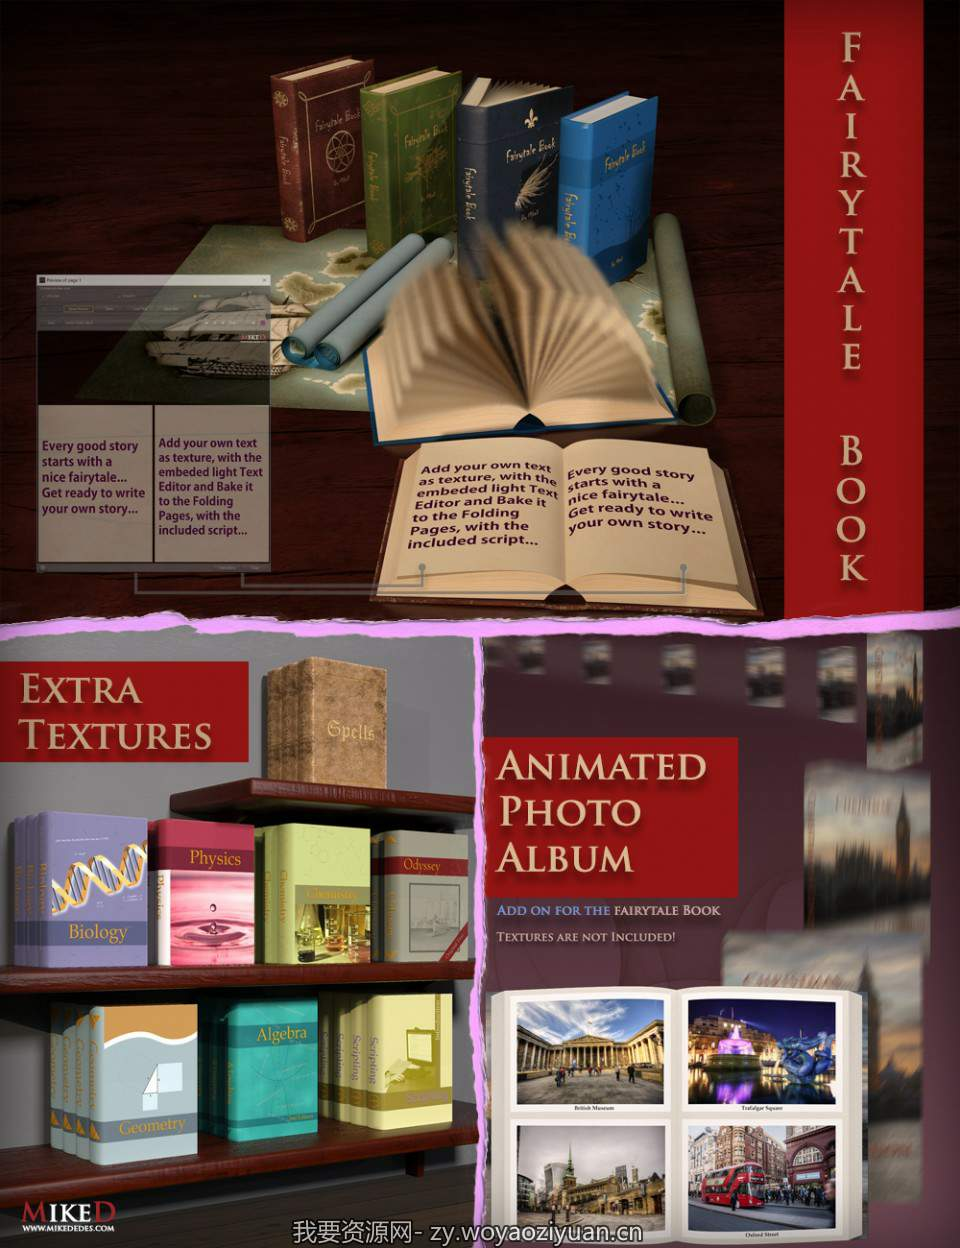 The Fairytale Book Bundle